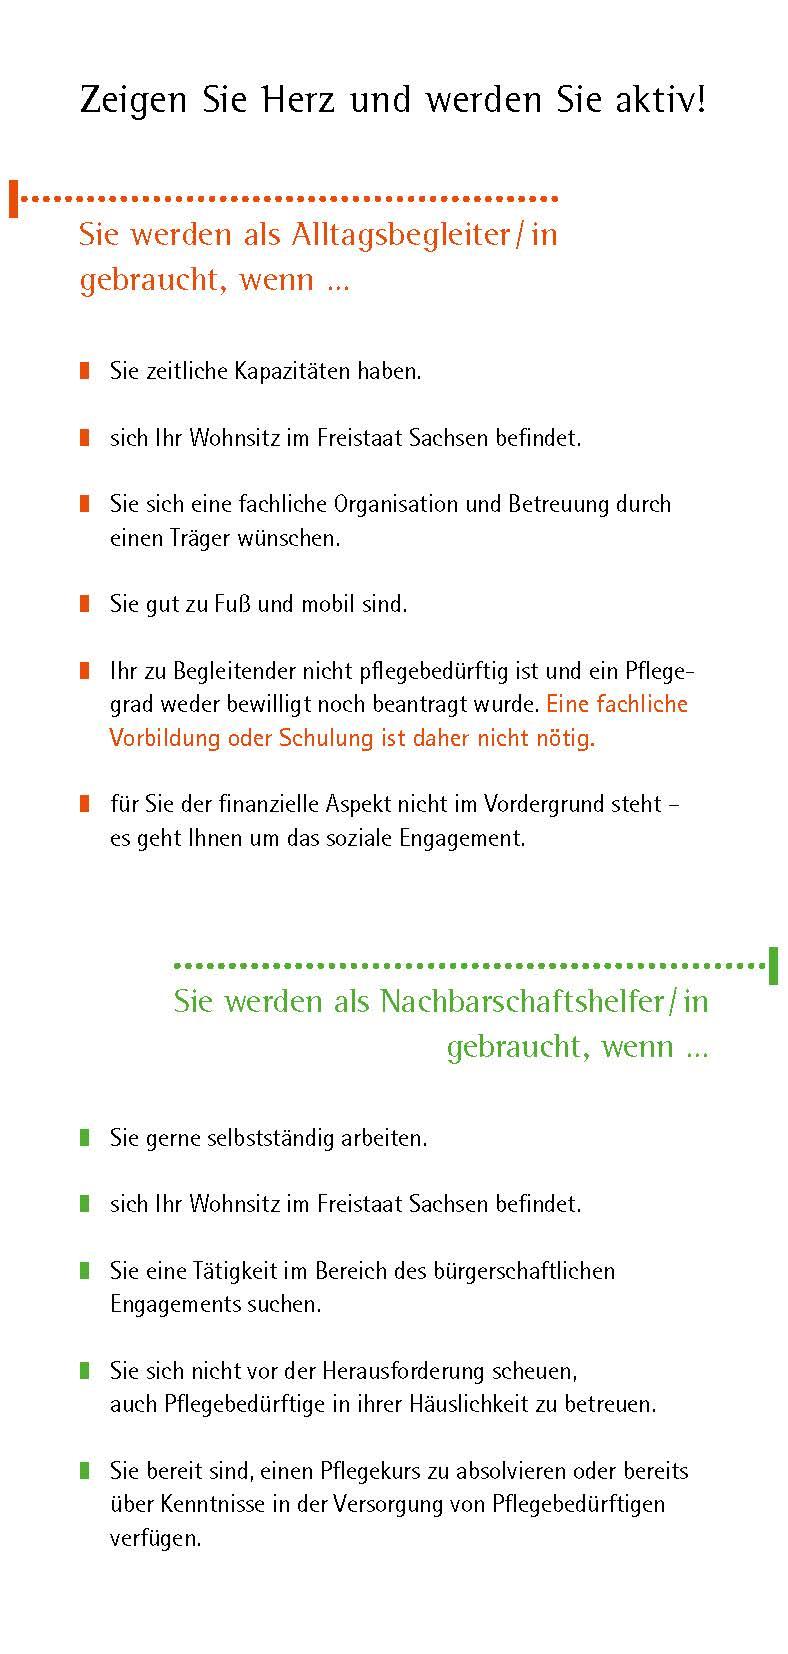 2019_FSS_FB_Nachbarschaftshilfe-Alltagsbegleitung_PDF-UA_Seite_3.jpg